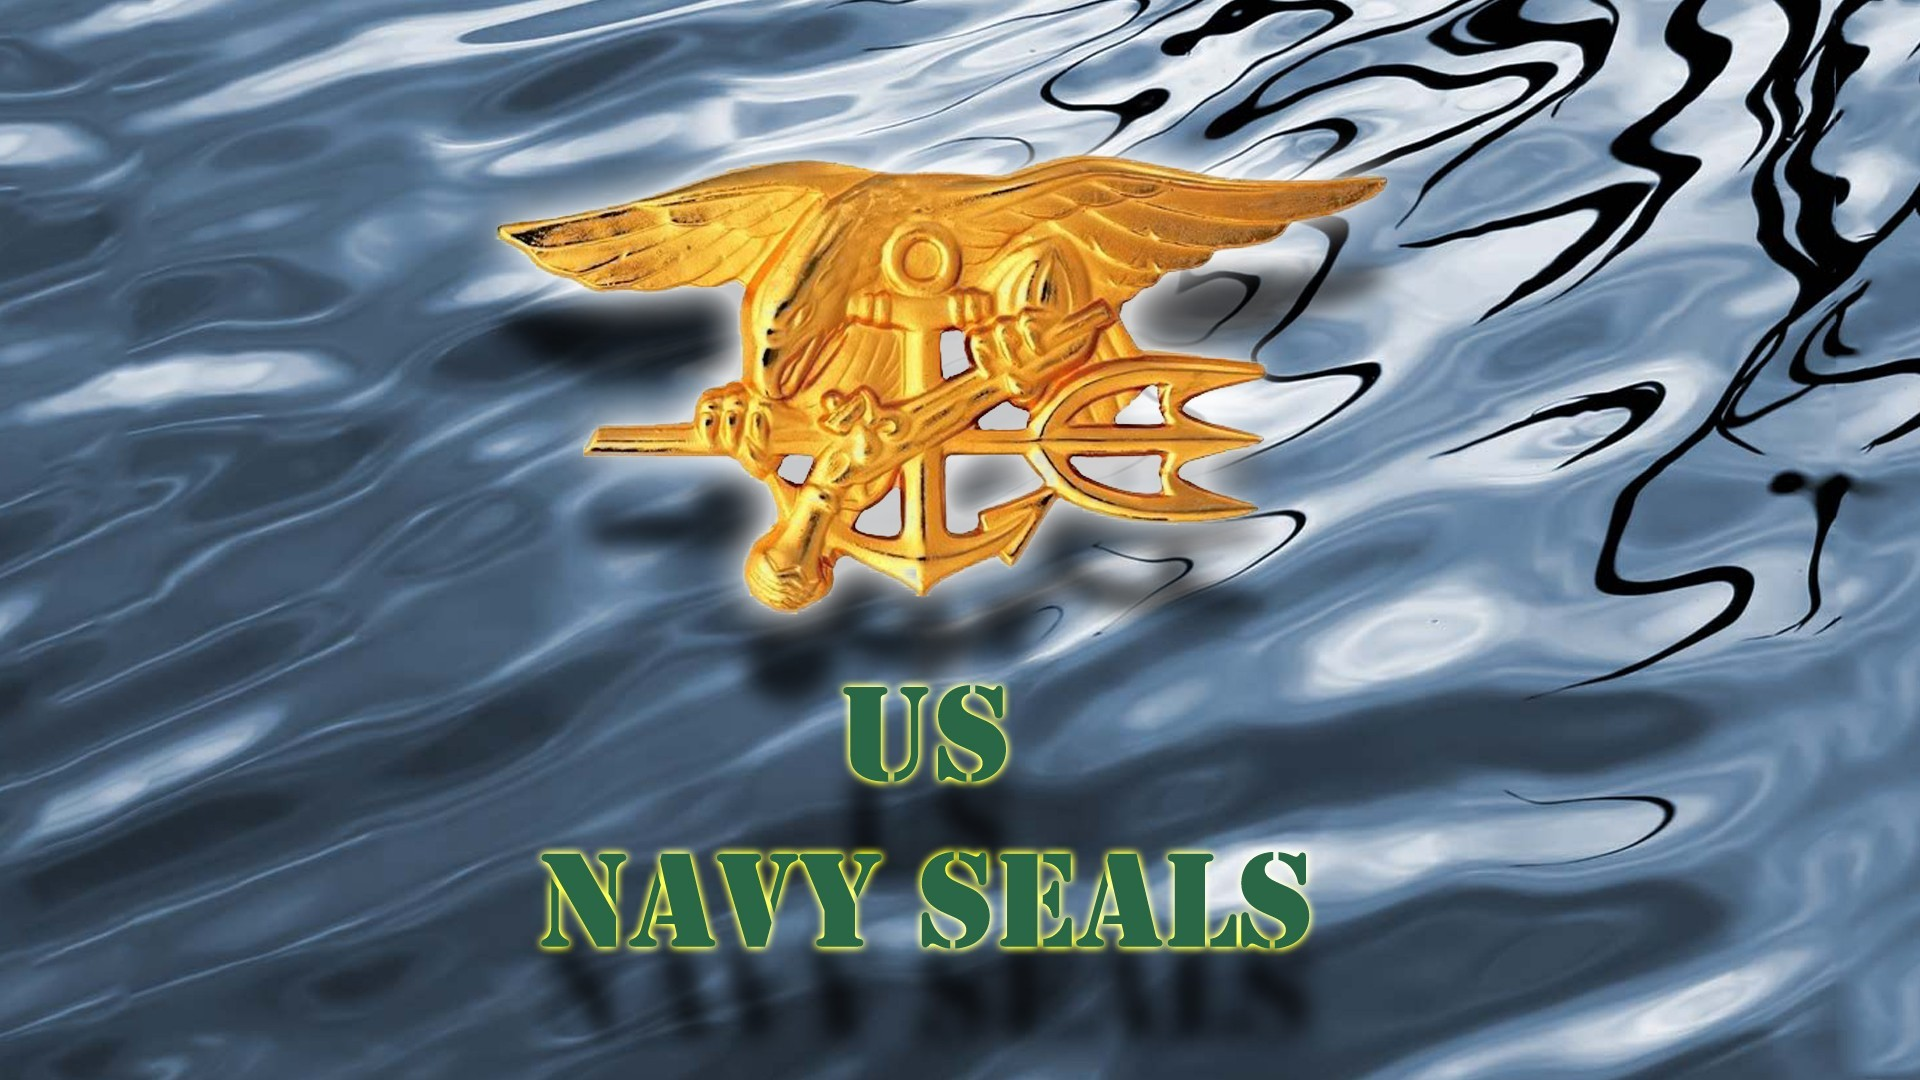 1920x1080 Navy Seals Logo Wallpaper